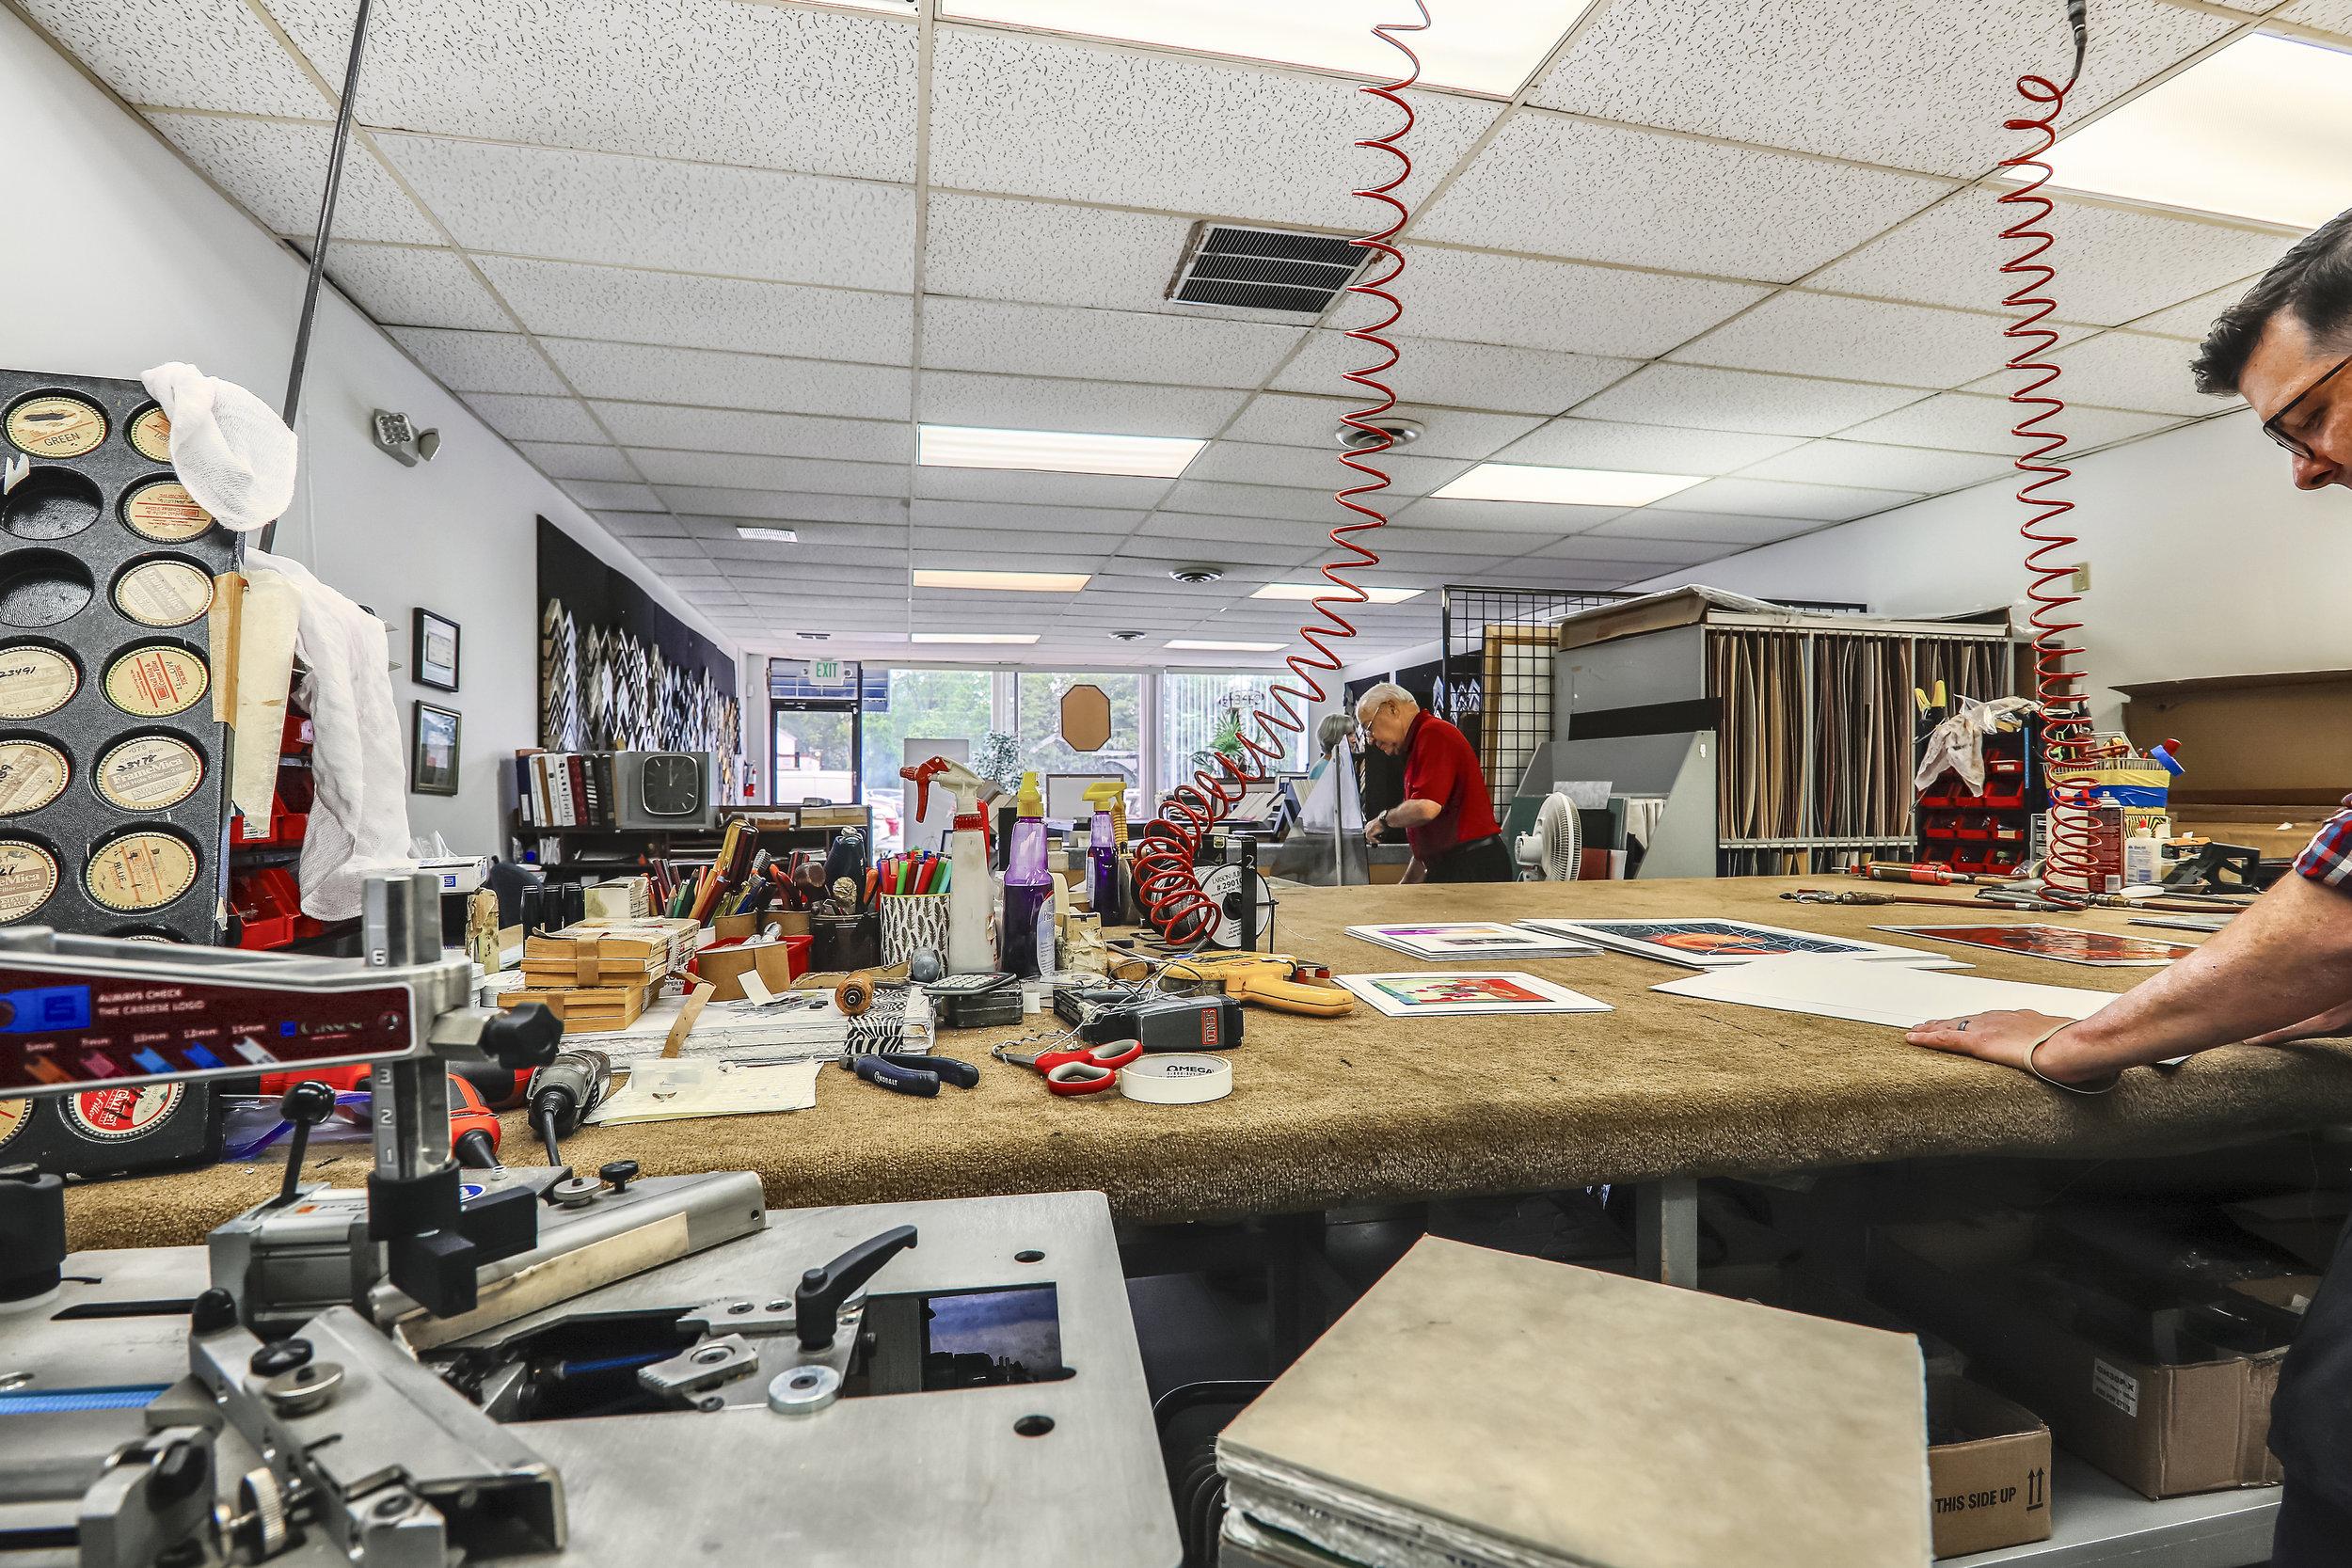 Interiors-Work Station-MG2017.JPG